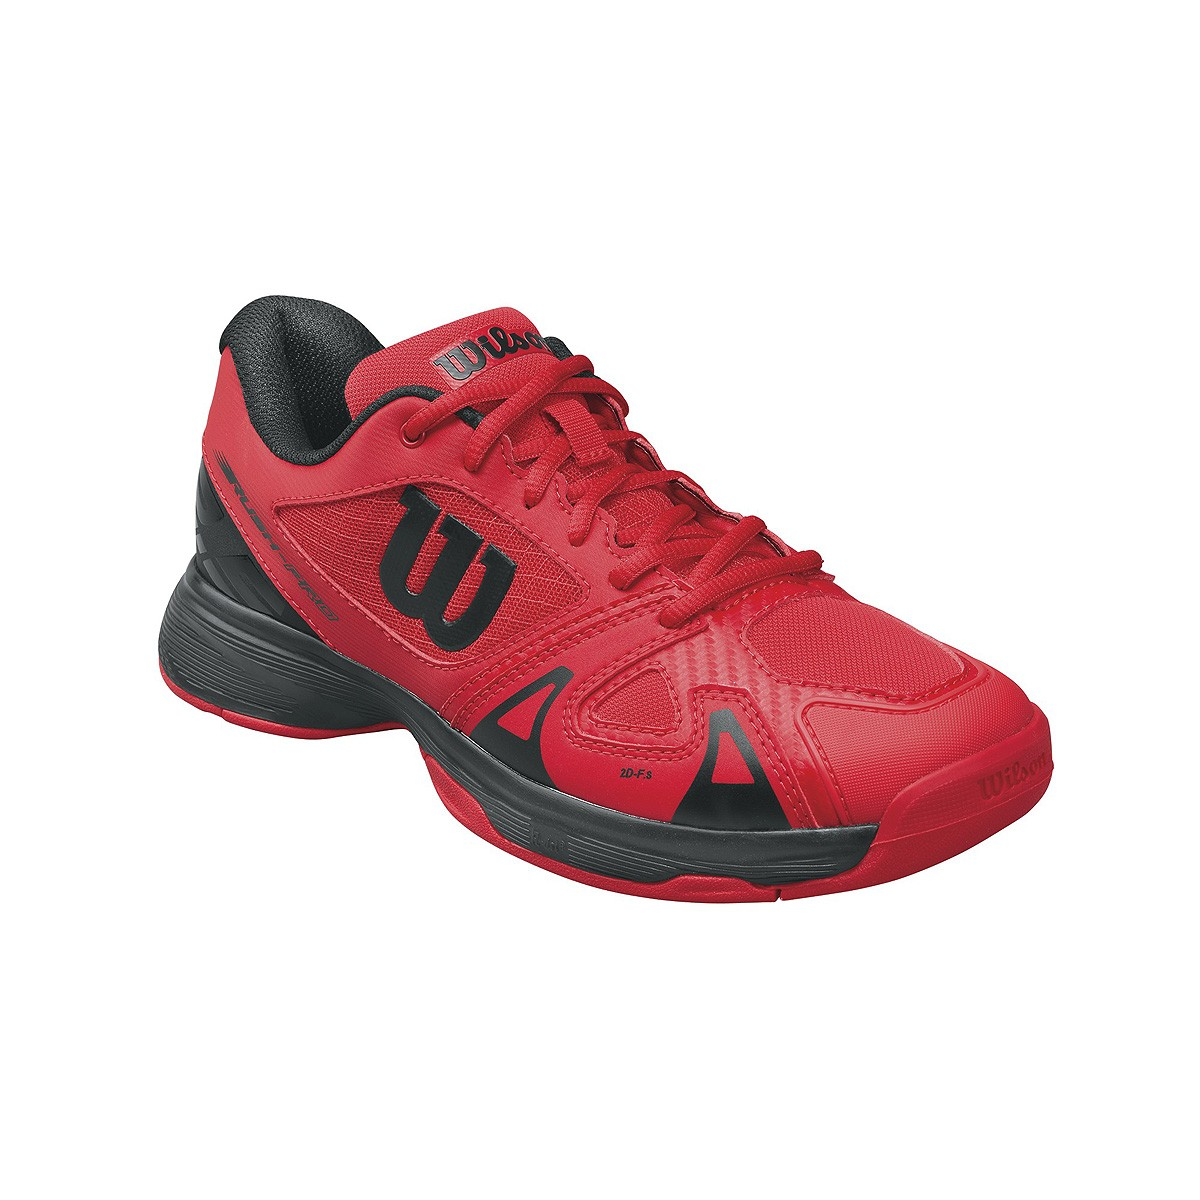 Buty tenisowe Wilson Rush Pro 2.5 Junior Red - Wyprzedaż!